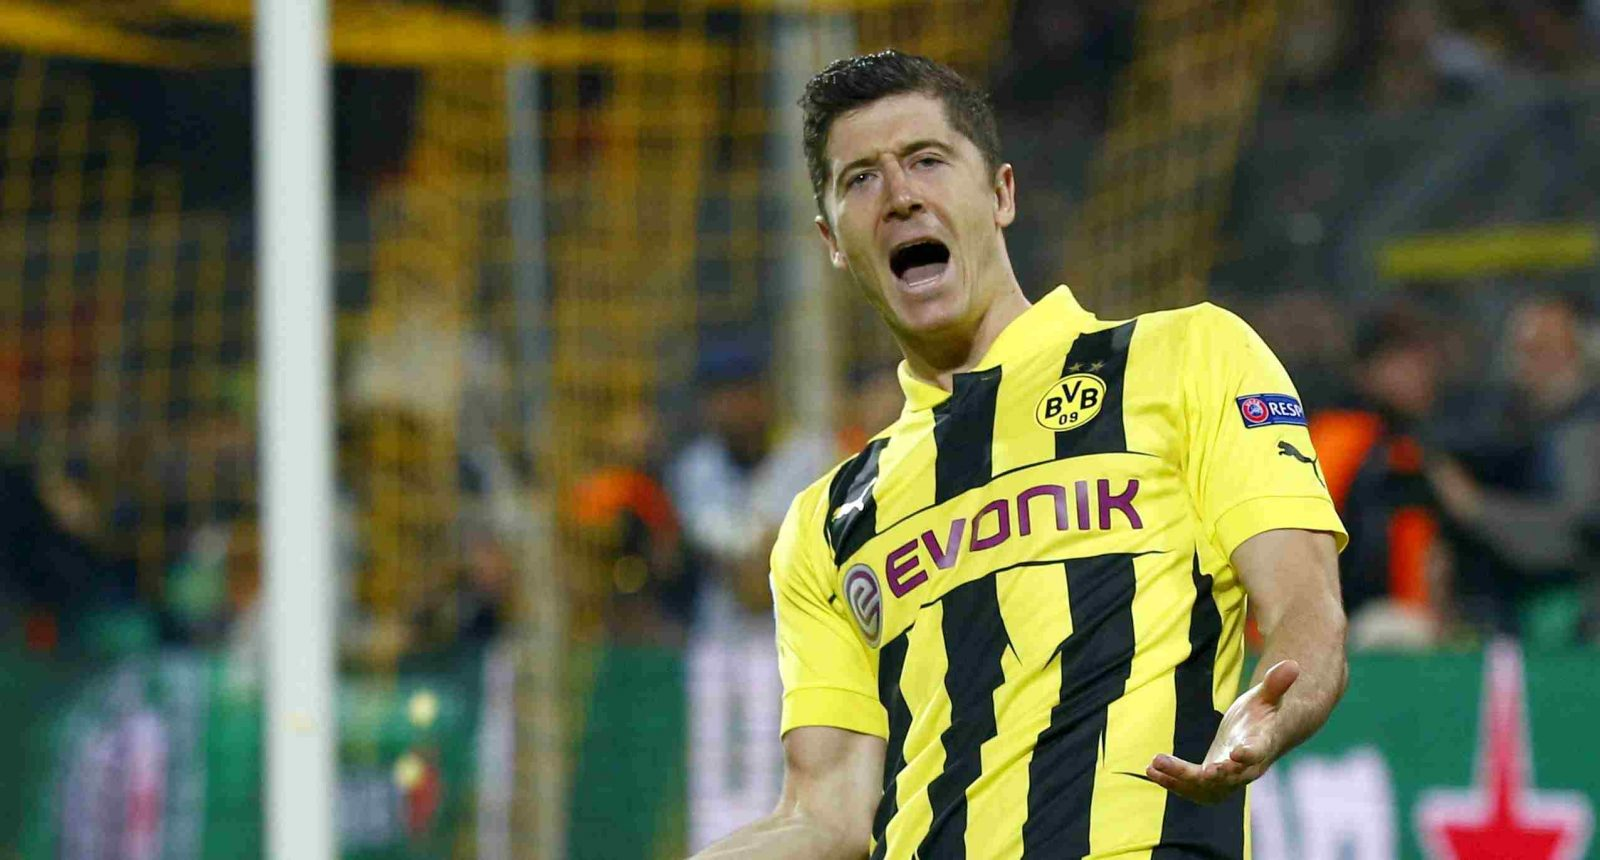 Lewandowski, un acierto ficharlo, un error no venderlo